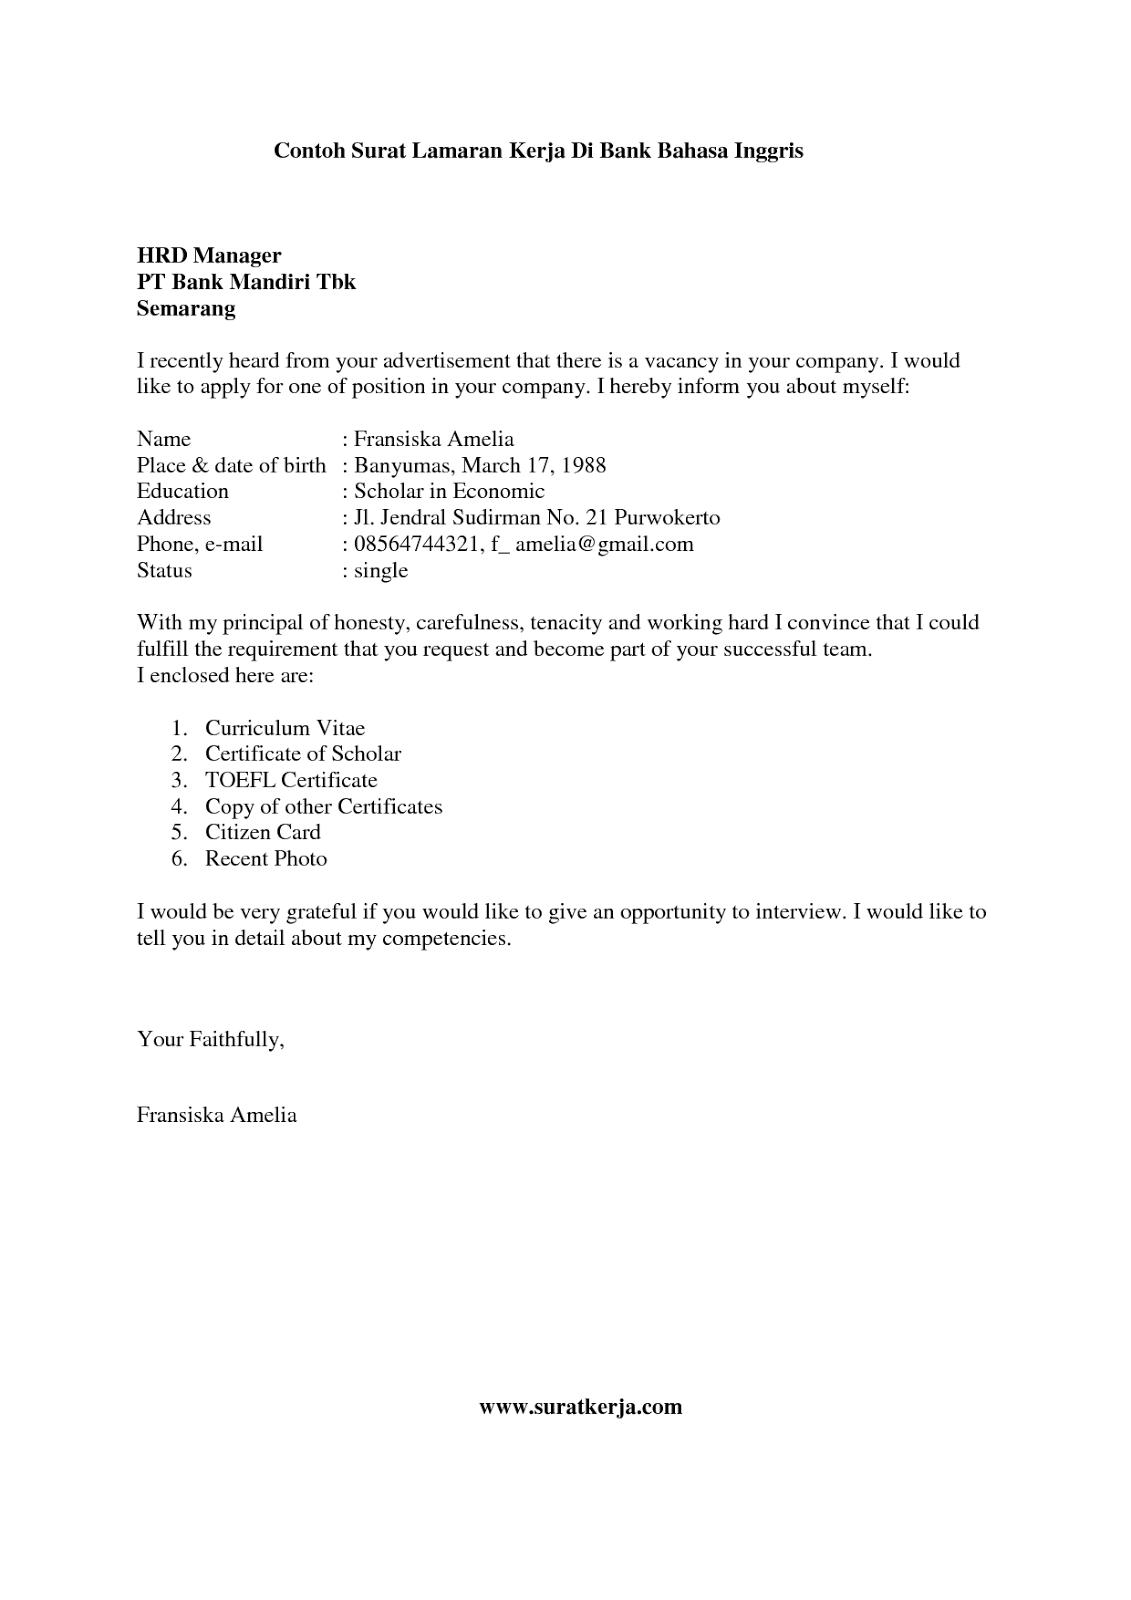 Menginginkan posisi pekerjaan sebagai apoteker maka surat lamaran. Contoh Surat Lamaran Kerja Bank - Tips Motivasi